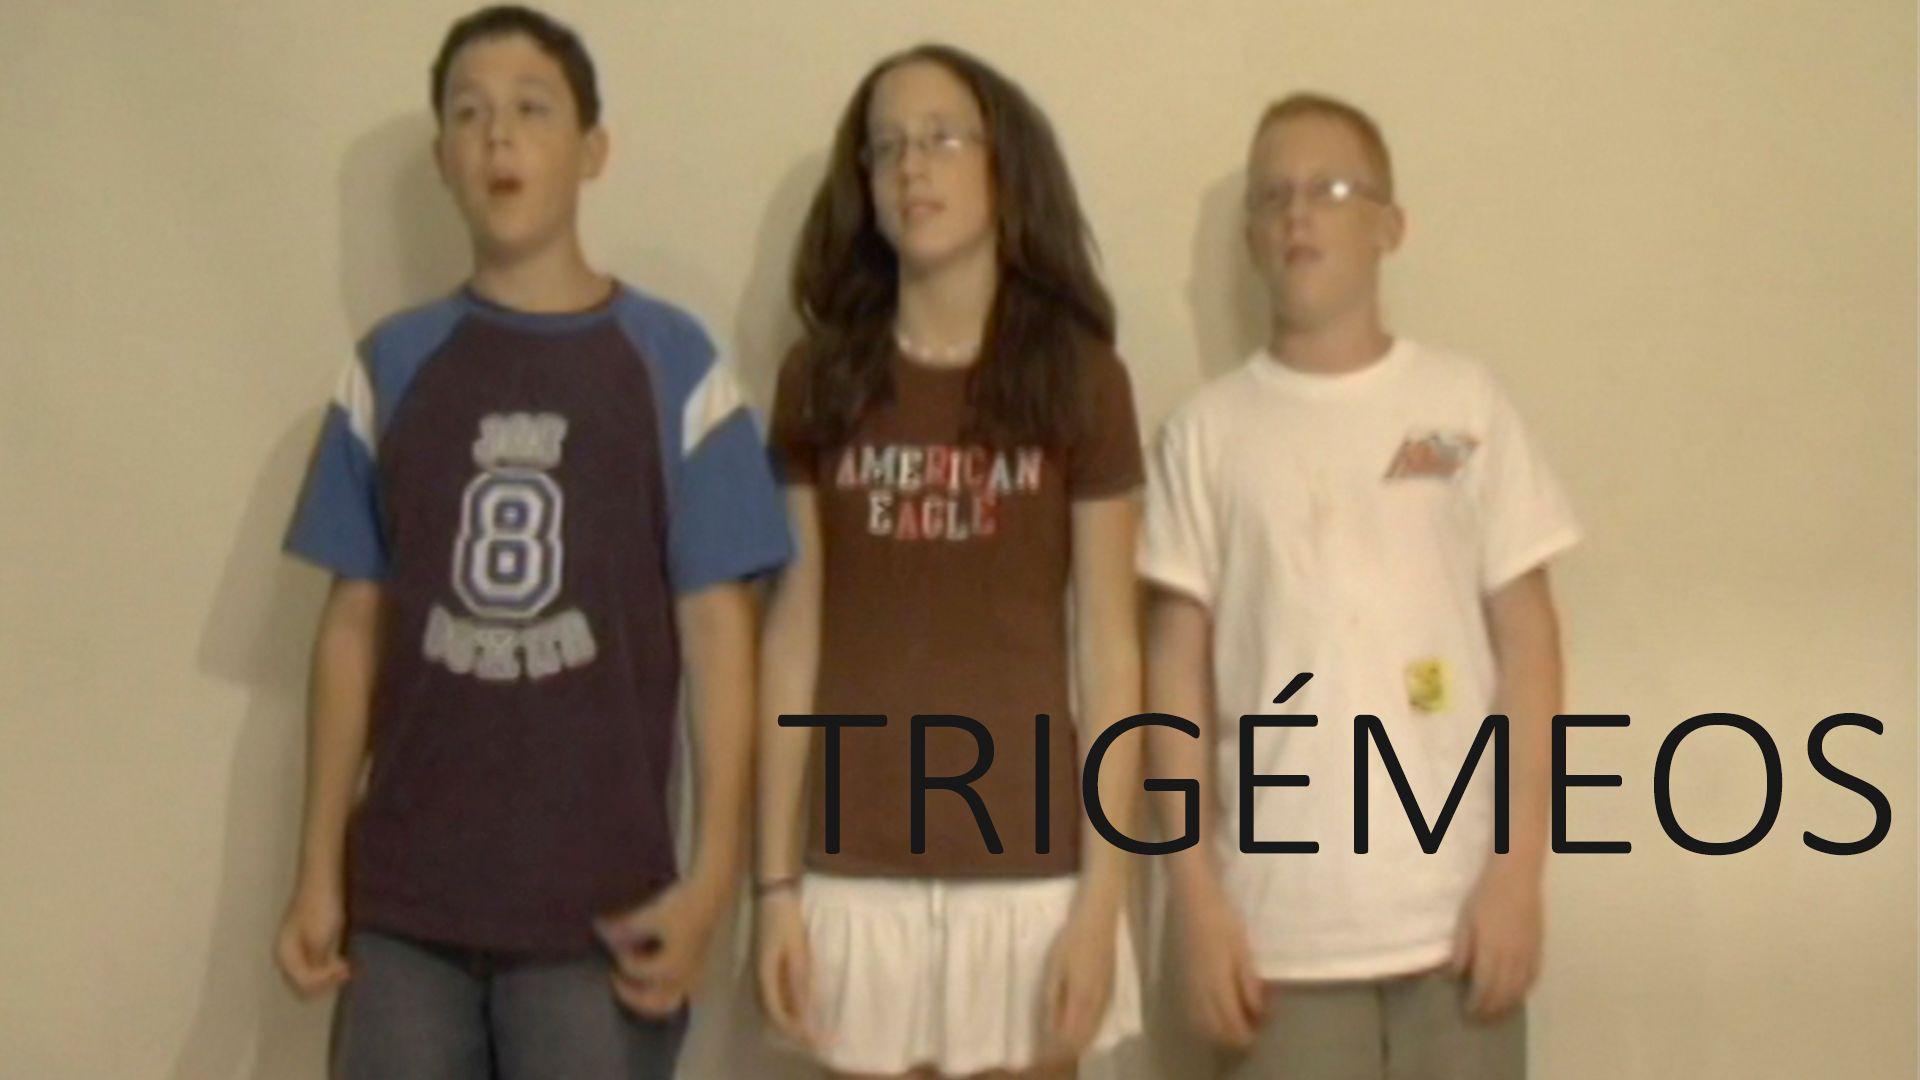 Trigémeos